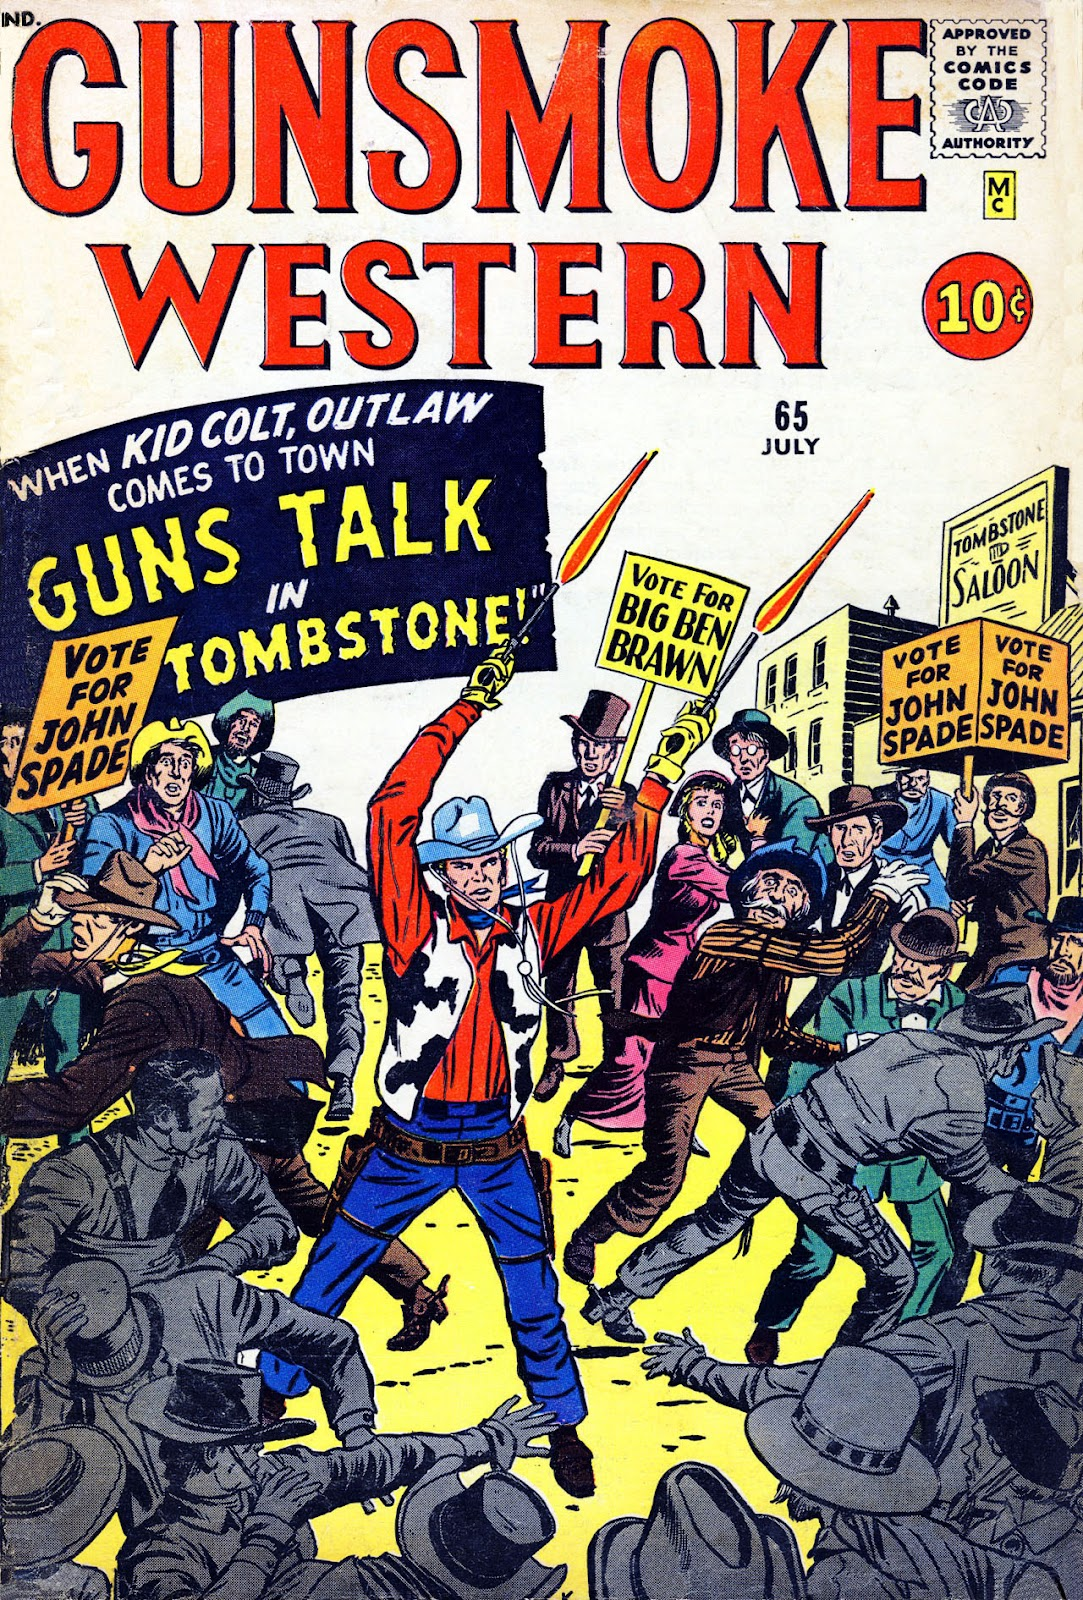 Gunsmoke Western issue 65 - Page 1